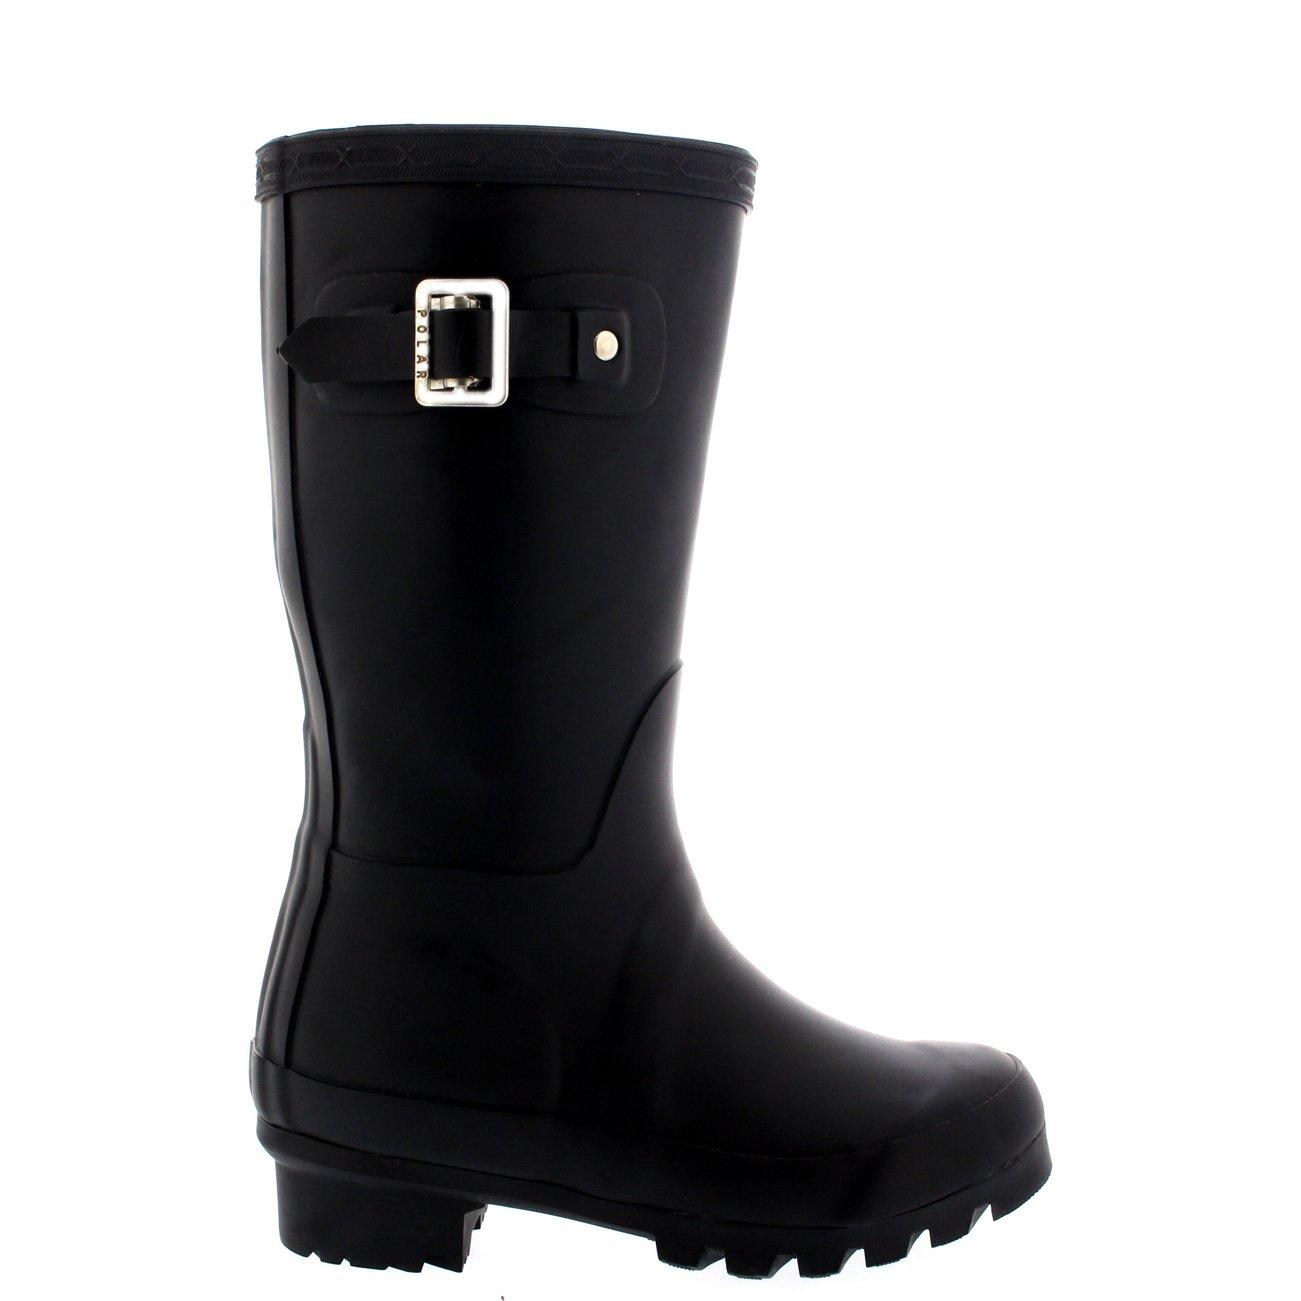 Unisex Kids Original Plain Wellie Rain Snow Winter Waterproof Mud Boots - 4 - BLA36 BL0189 by POLAR (Image #4)